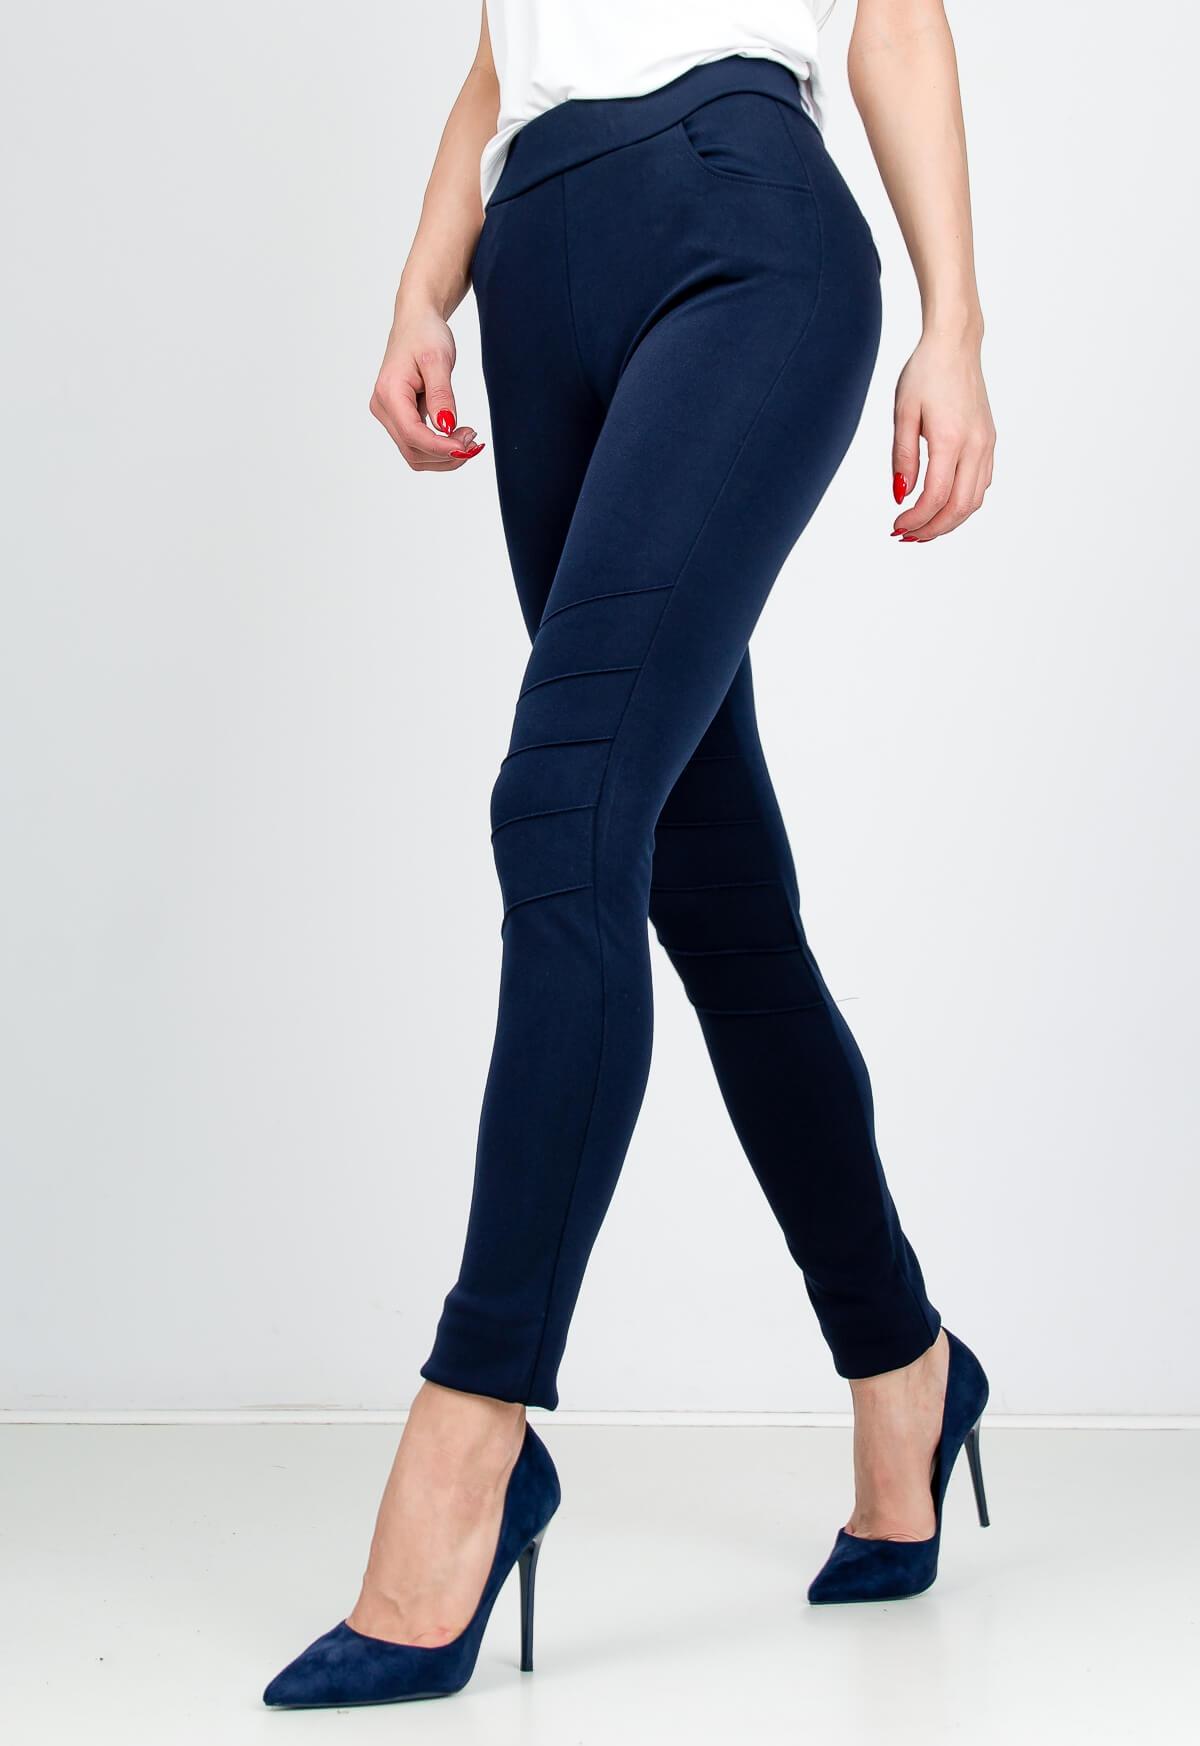 6d915c3d999e Elegantné tmavo modré nohavice s elastickým pásom - ROUZIT.SK